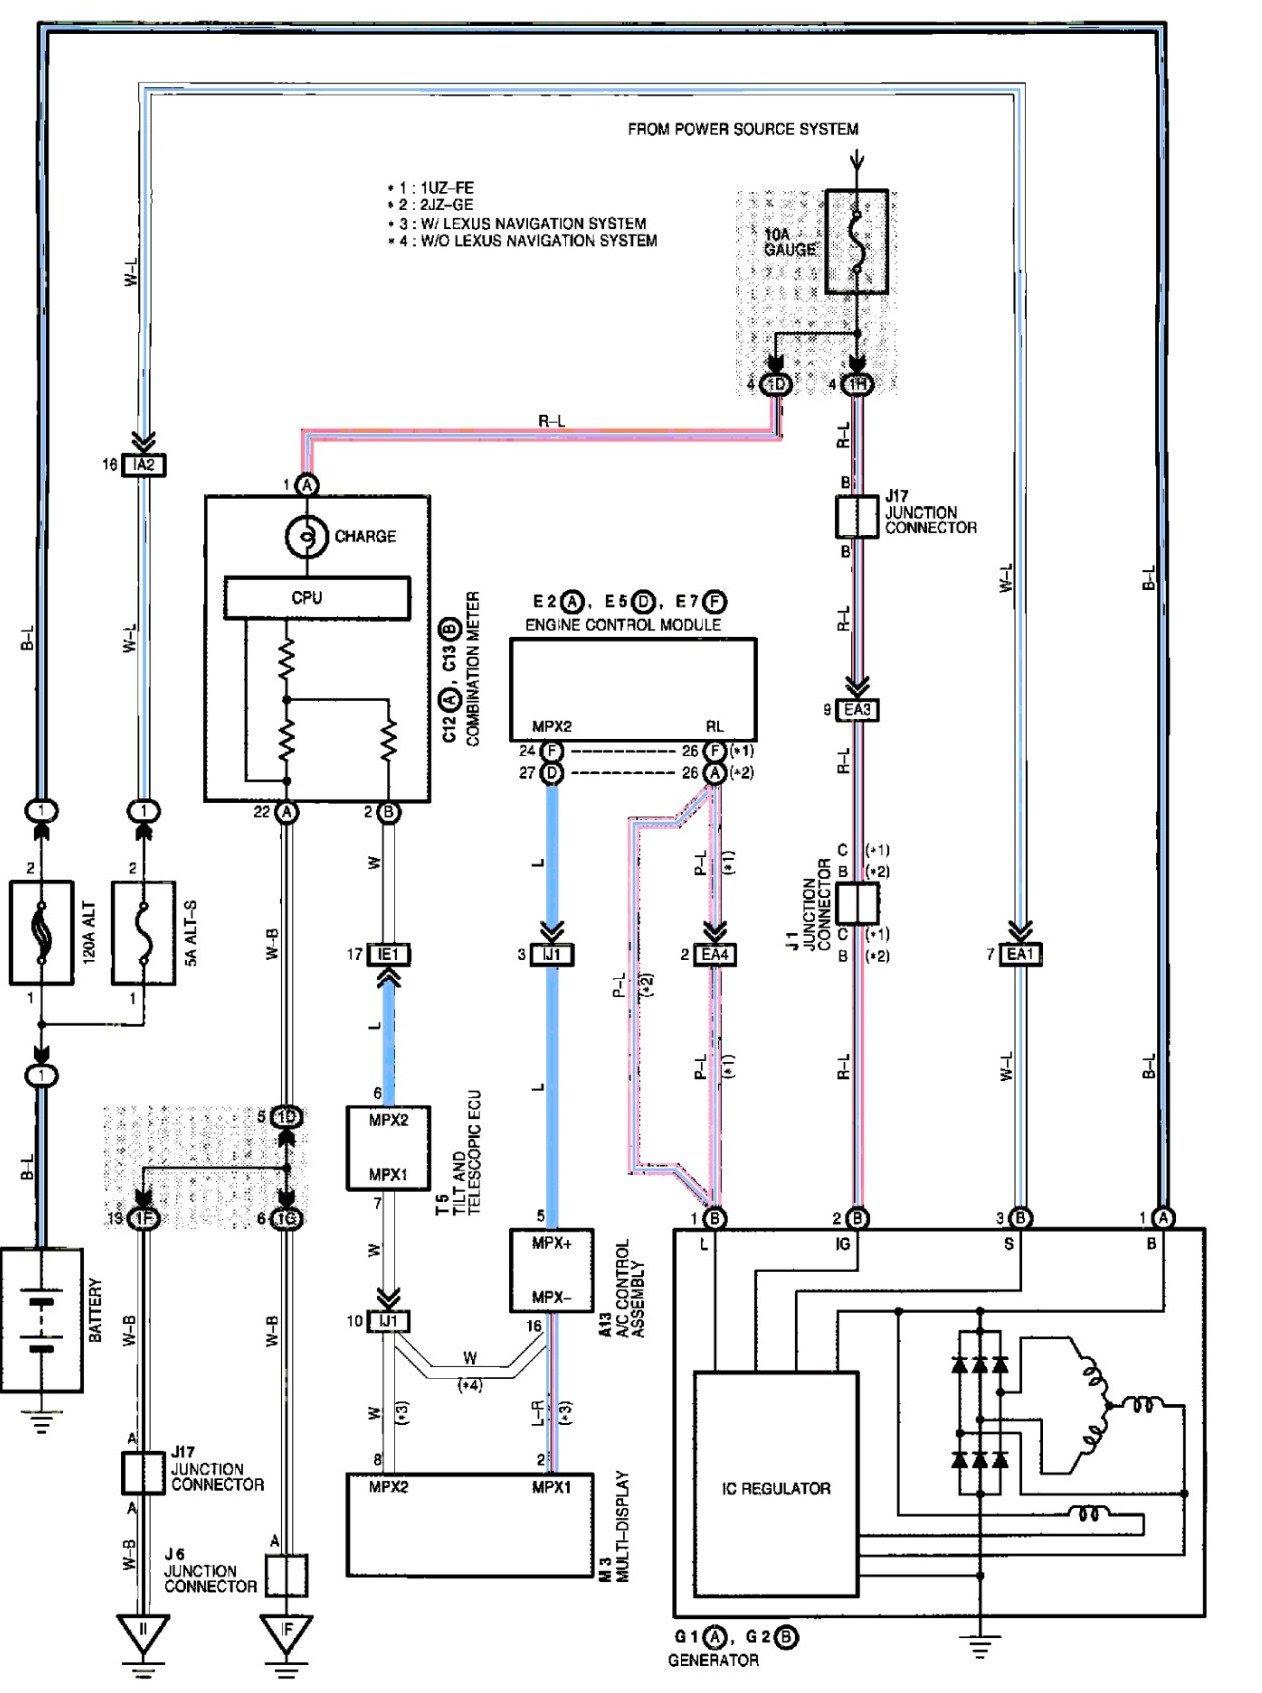 Diagram Fuse Box Diagram 96 Lexus Gs300 Full Version Hd Quality Lexus Gs300 Shipwiringl Ripettapalace It